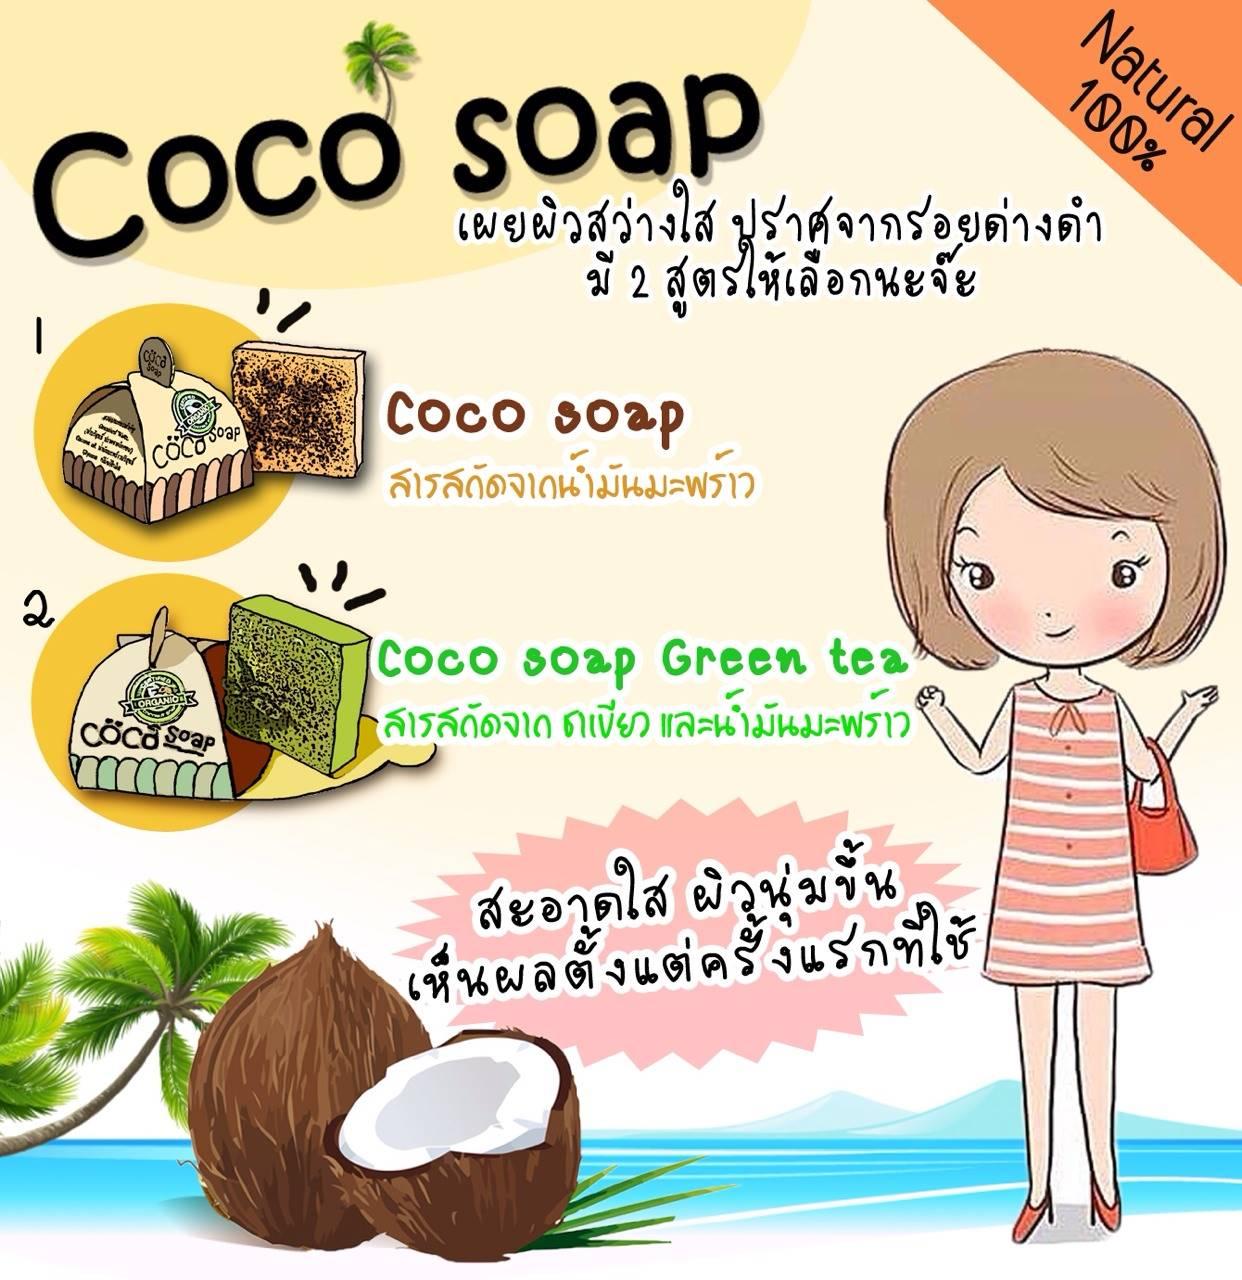 CoCo Soap Plus green tea, CoCo Soap green tea, coco soap, สบู่มะพร้าว coco soap, สบู่มะพร้าวชาเขียว, สบู่มะพร้าว, สบู่มะพร้าว สรรพคุณ, สบู่ไข่ขาวสวีเดน, สบู่ล้างหน้า, สบู่ล้างหน้าที่ดีที่สุด, สบู่ล้างหน้า cetaphil, สบู่ล้างหน้า acne aid, สบู่ล้างหน้า สิว, สบู่ wink white รีวิว, สบู่ wink white ปลอม, สบู่ wink white ของปลอม, สบู่ชาเขียว pantip, สบู่ wink white แท้, สบู่ wink white ของแท้, สบู่เต้าหู้, สบู่ชาเขียว, สบู่ชาเขียวญี่ปุ่น, สบู่แครอท, สบู่เบนเนท, สบู่ มาดามเฮง,